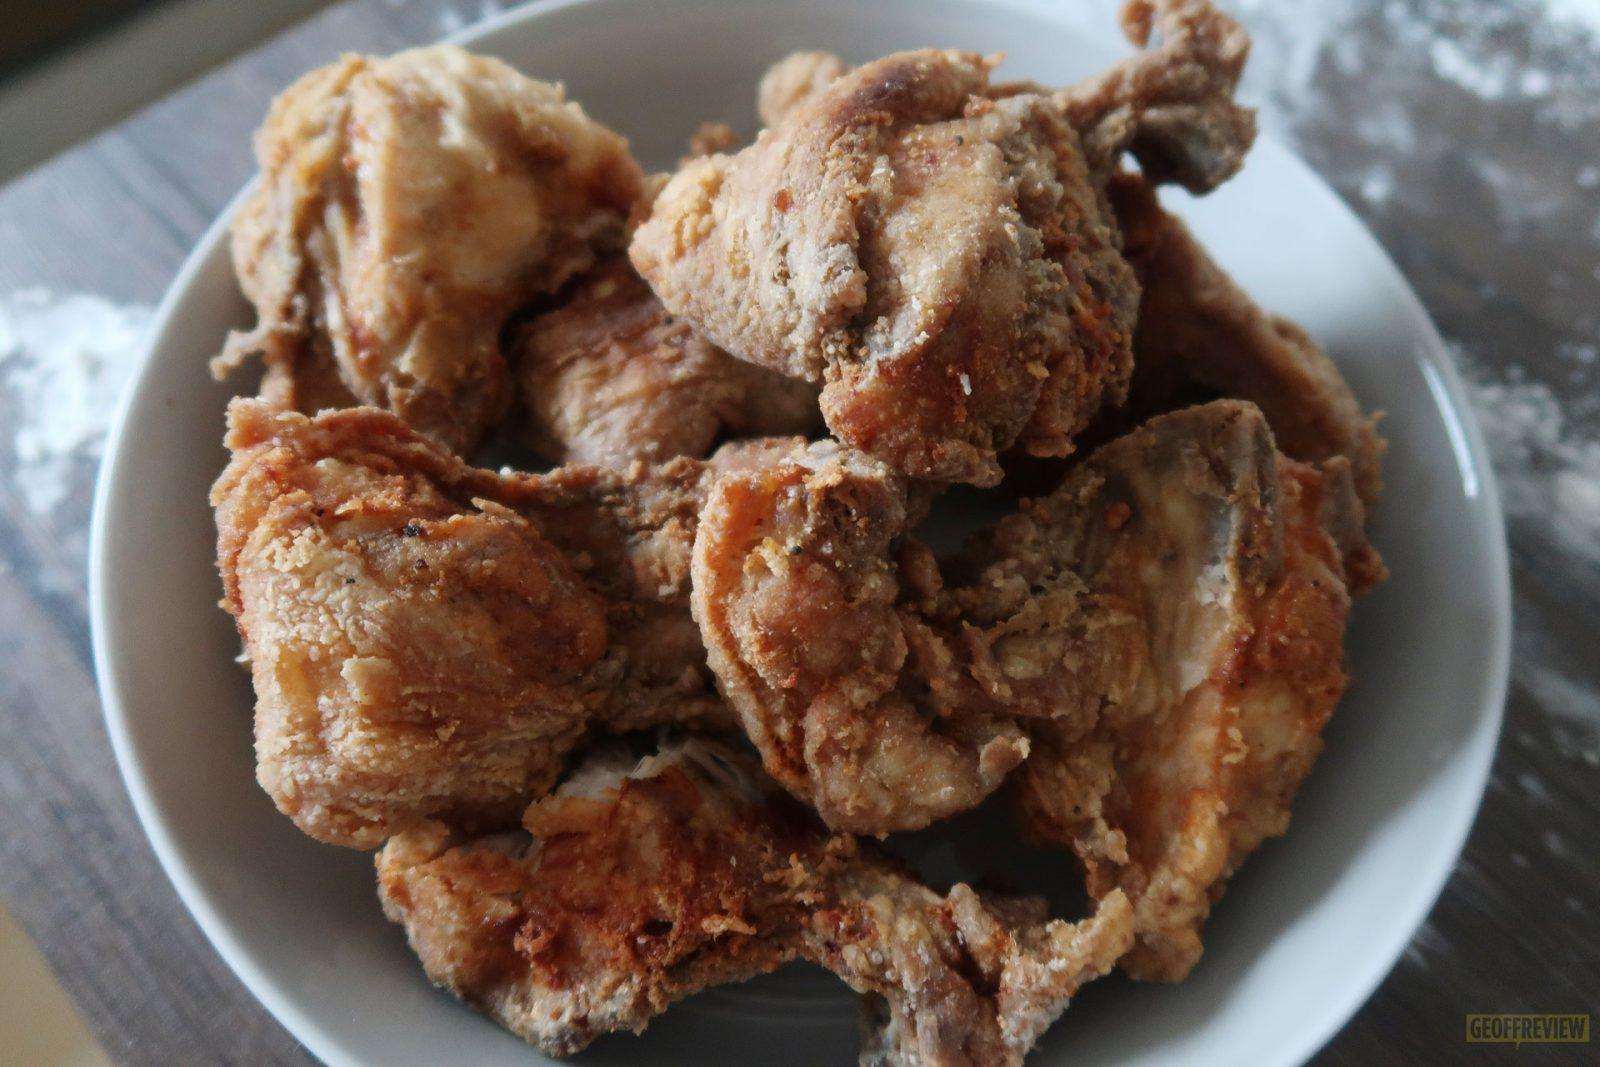 jollibee chickenjoy recipe